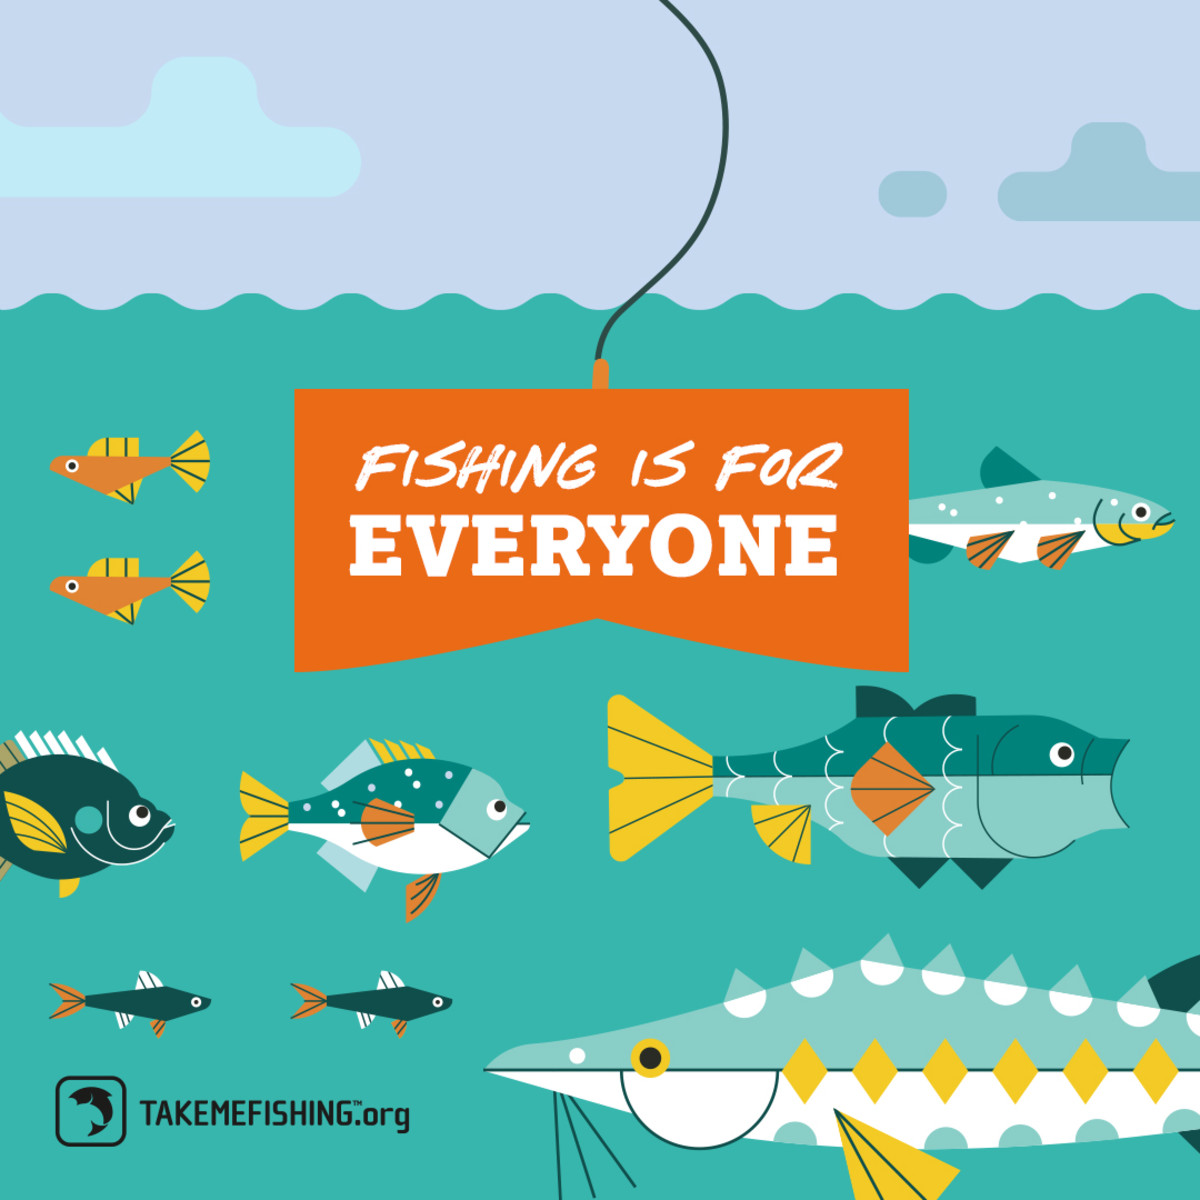 2_67079_RBFF_Social_FishingIsForEveryone_TMF_1080x1080